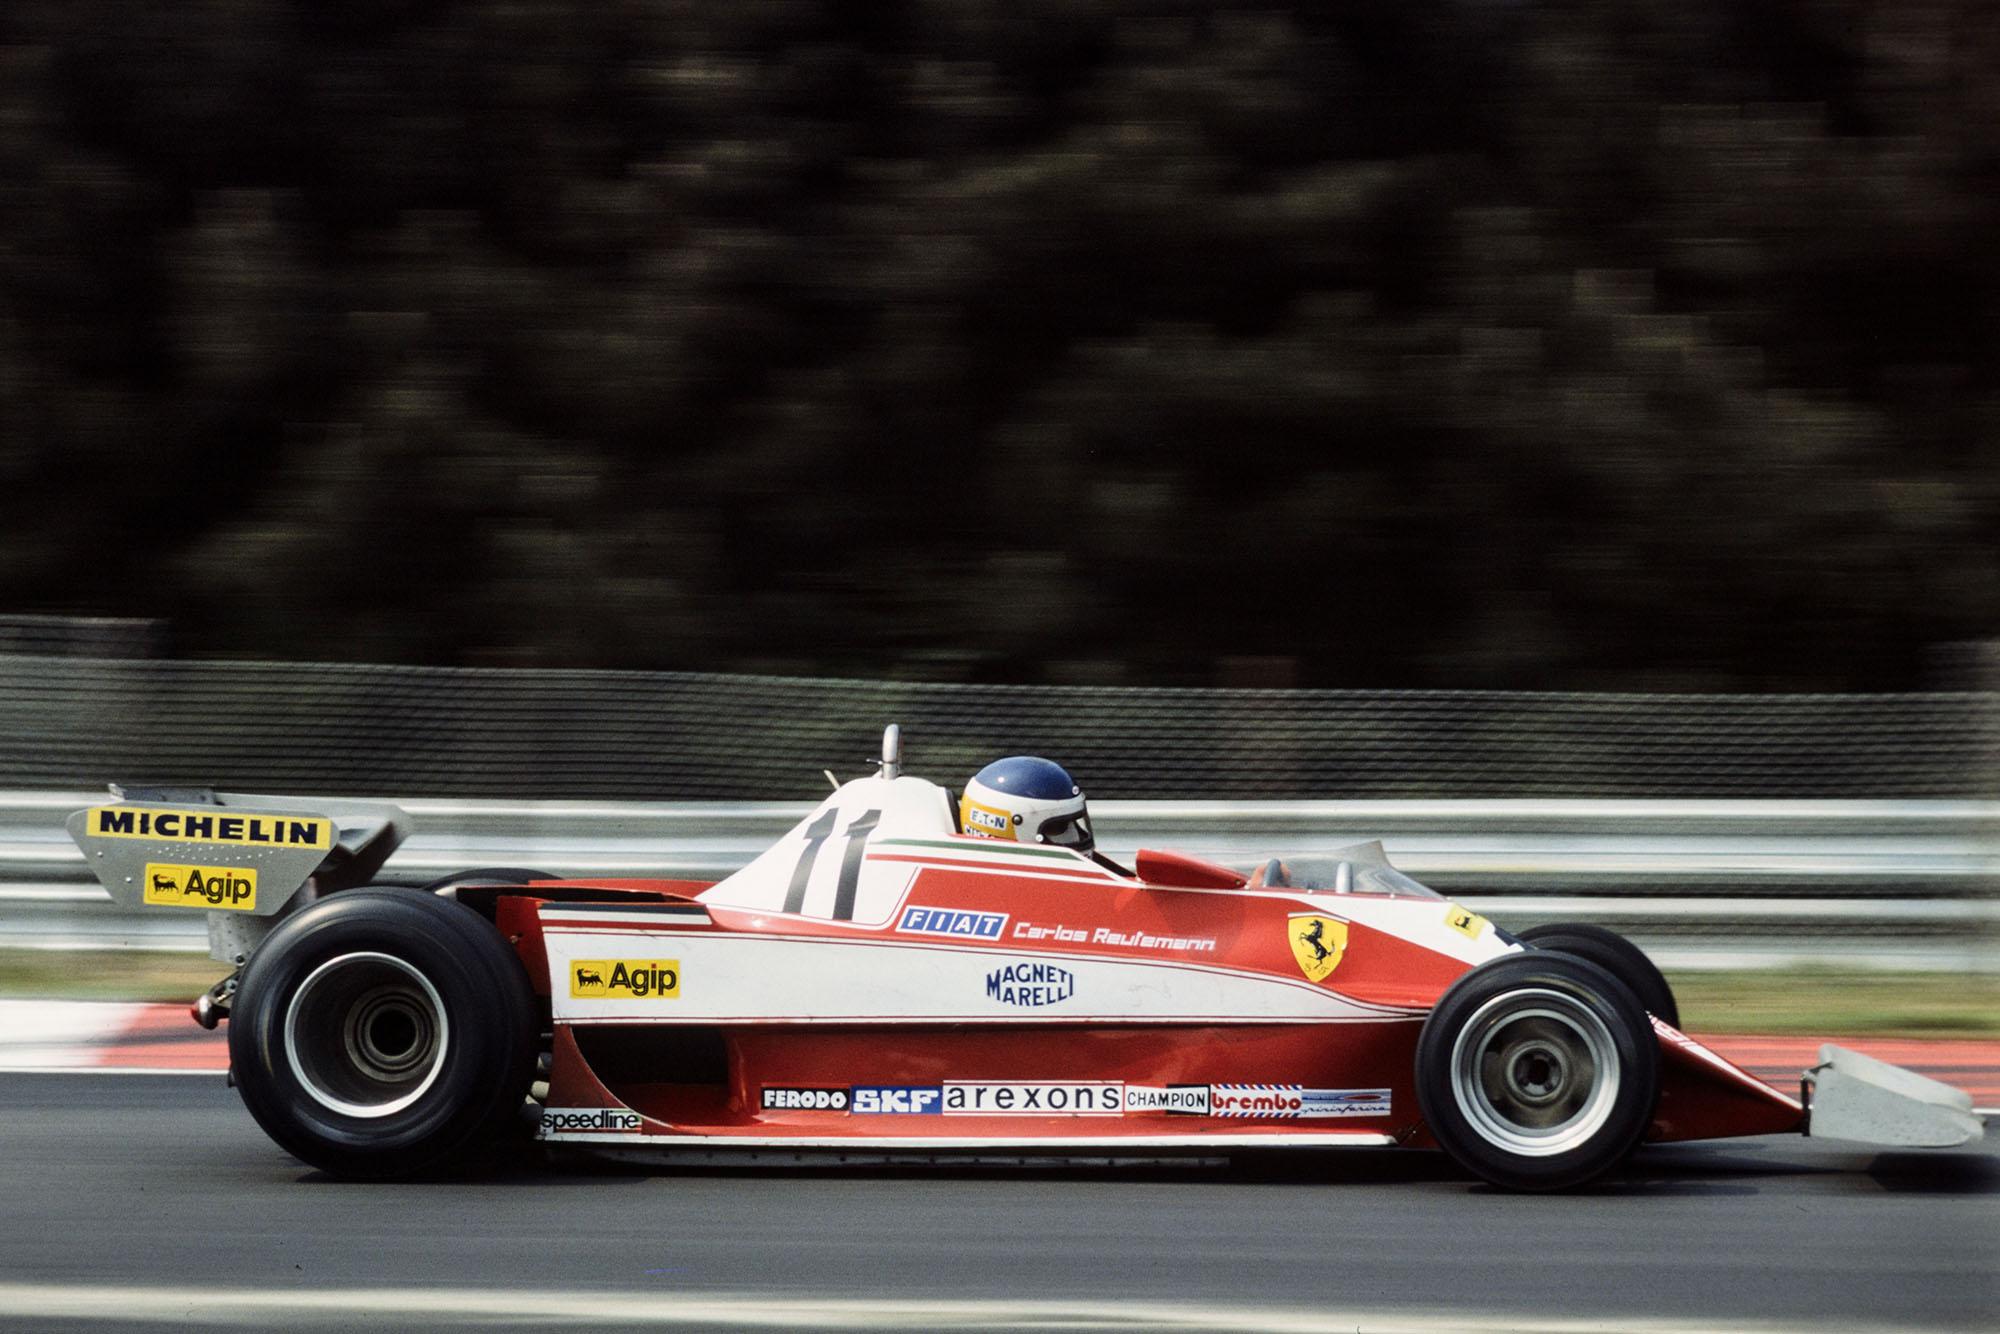 Carlos Reutemann (Ferrari) driving at the 1978 Belgian Grand Prix, Zolder.